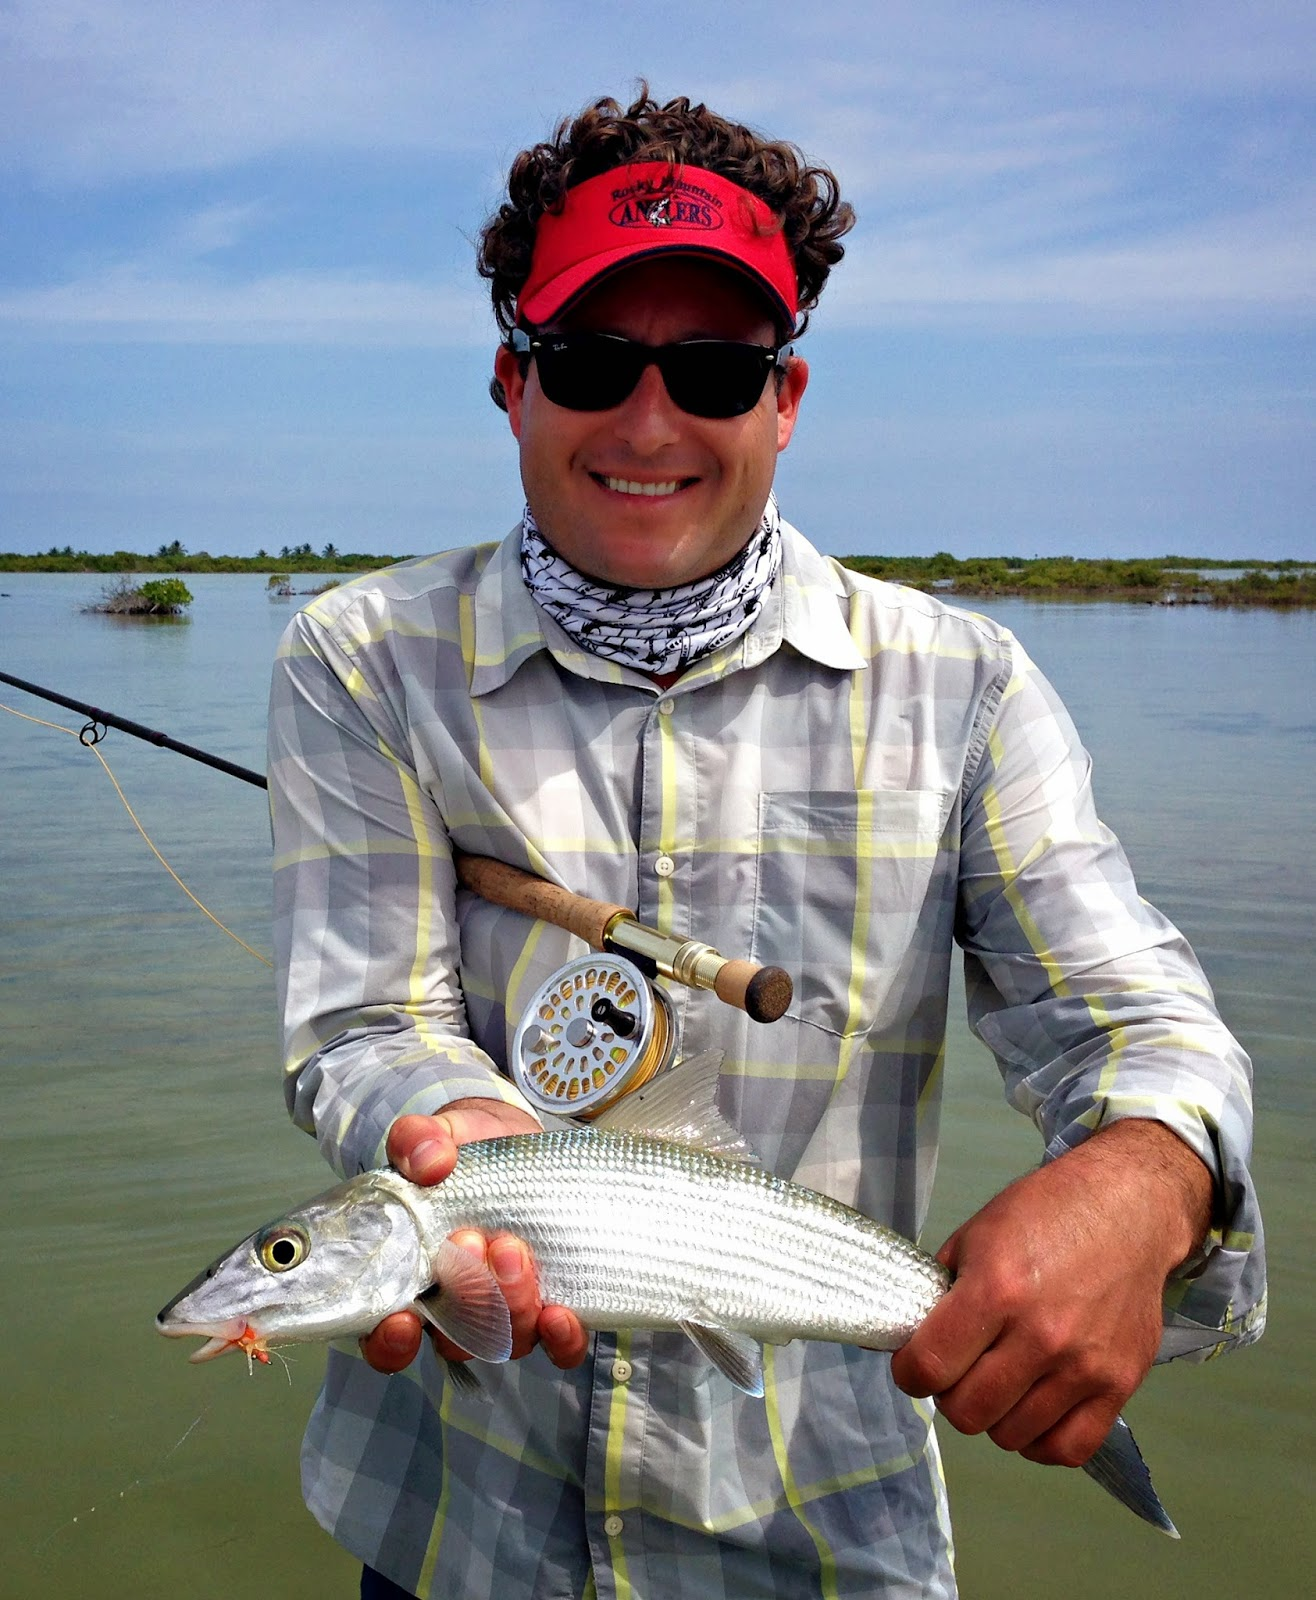 Life in motion fly fishing for bonefish cozumel flats for Fly fishing cozumel